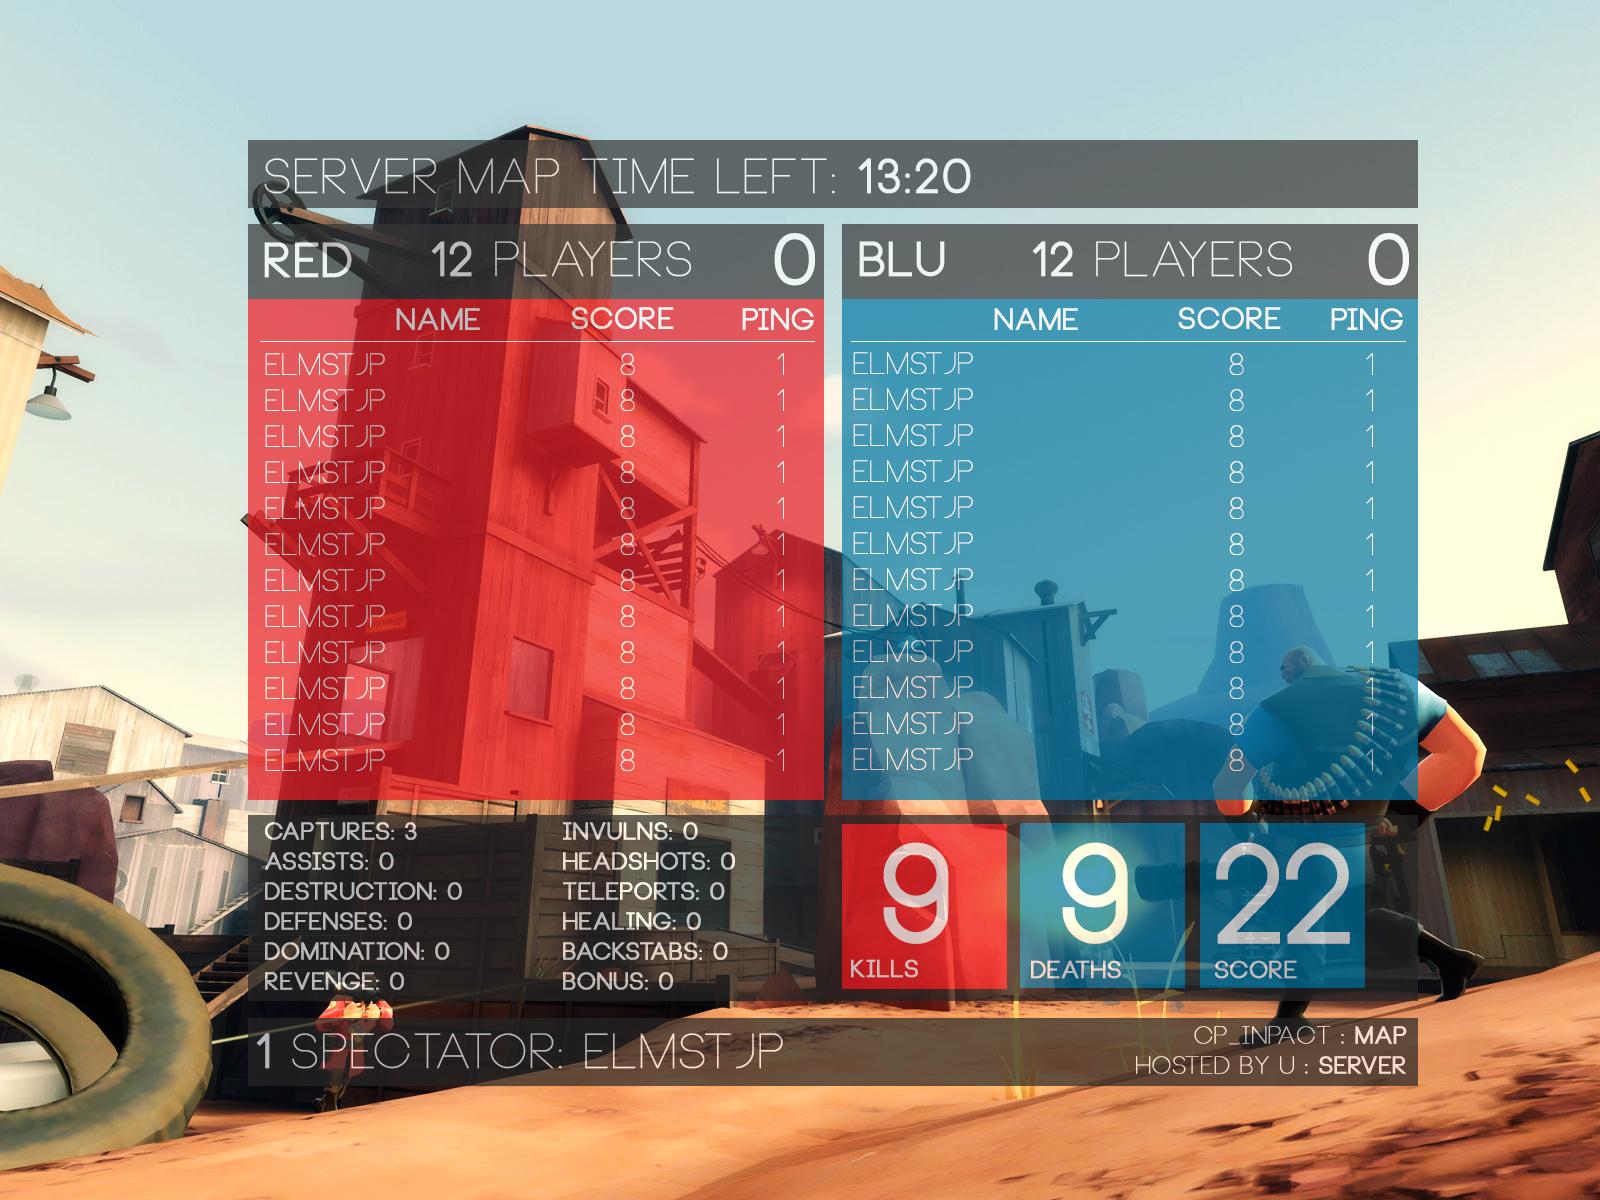 Design poster win8 - Tf2 Scoreboard Win8 Design By Almostjp Tf2 Scoreboard Win8 Design By Almostjp